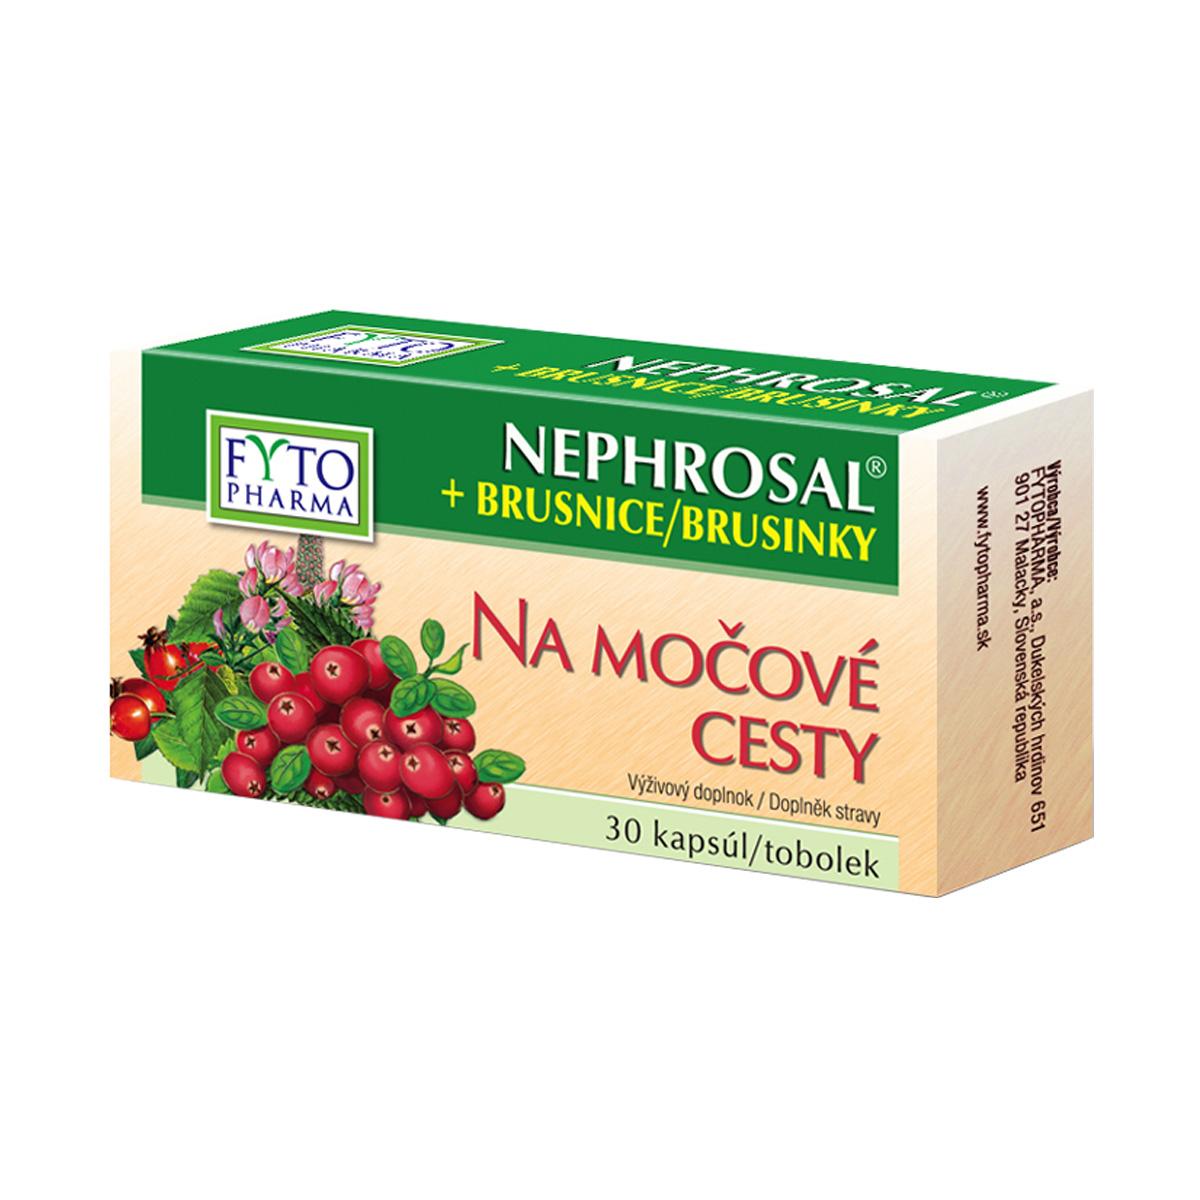 Fytopharma NEPHROSAL®+ brusinky tobolky na močové cesty 30 cps